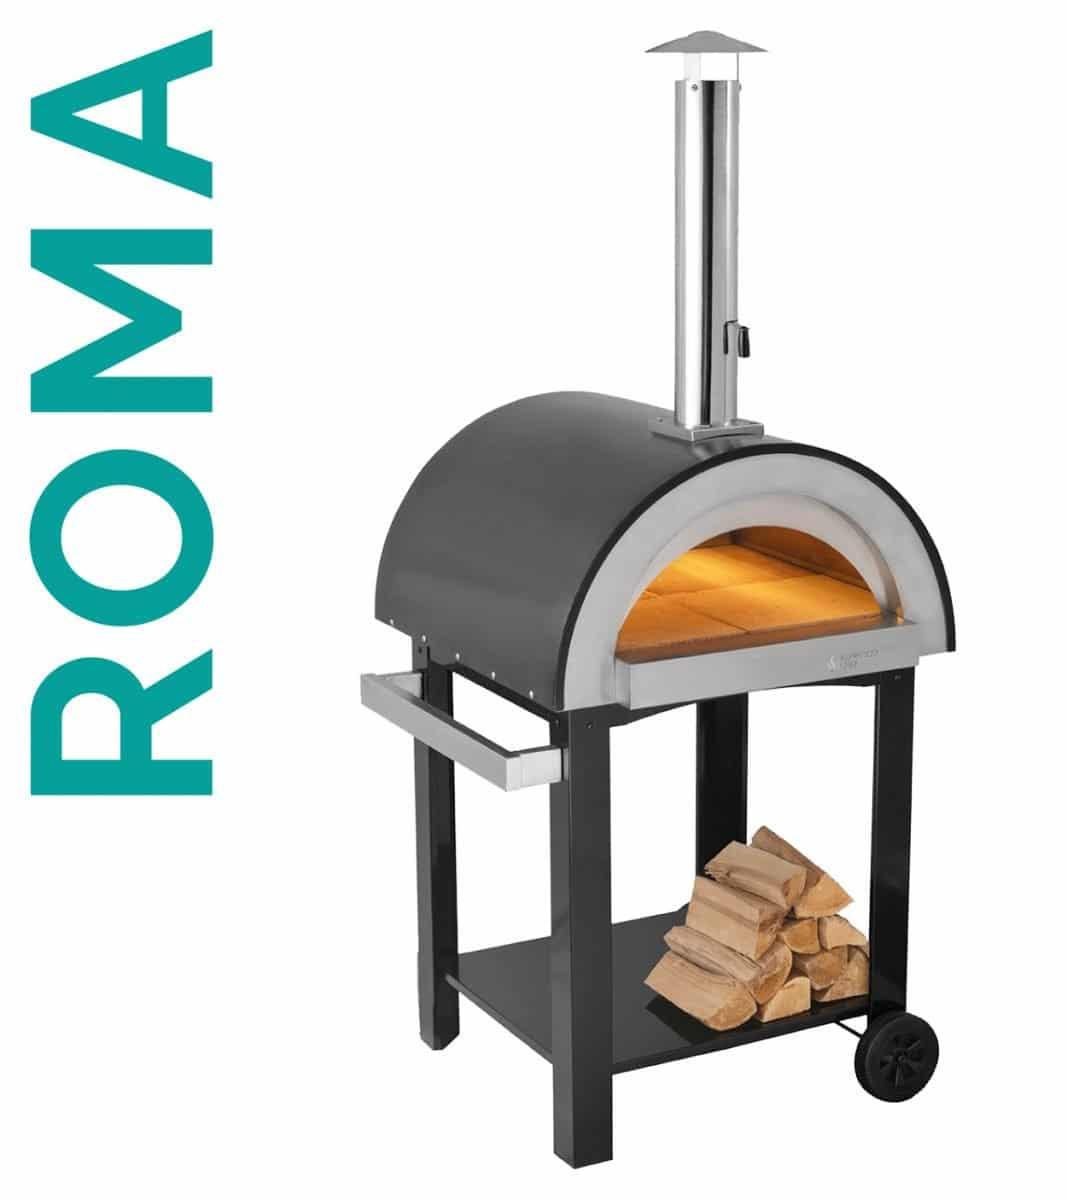 Roma Alfresco Chef Garden Pizza Oven